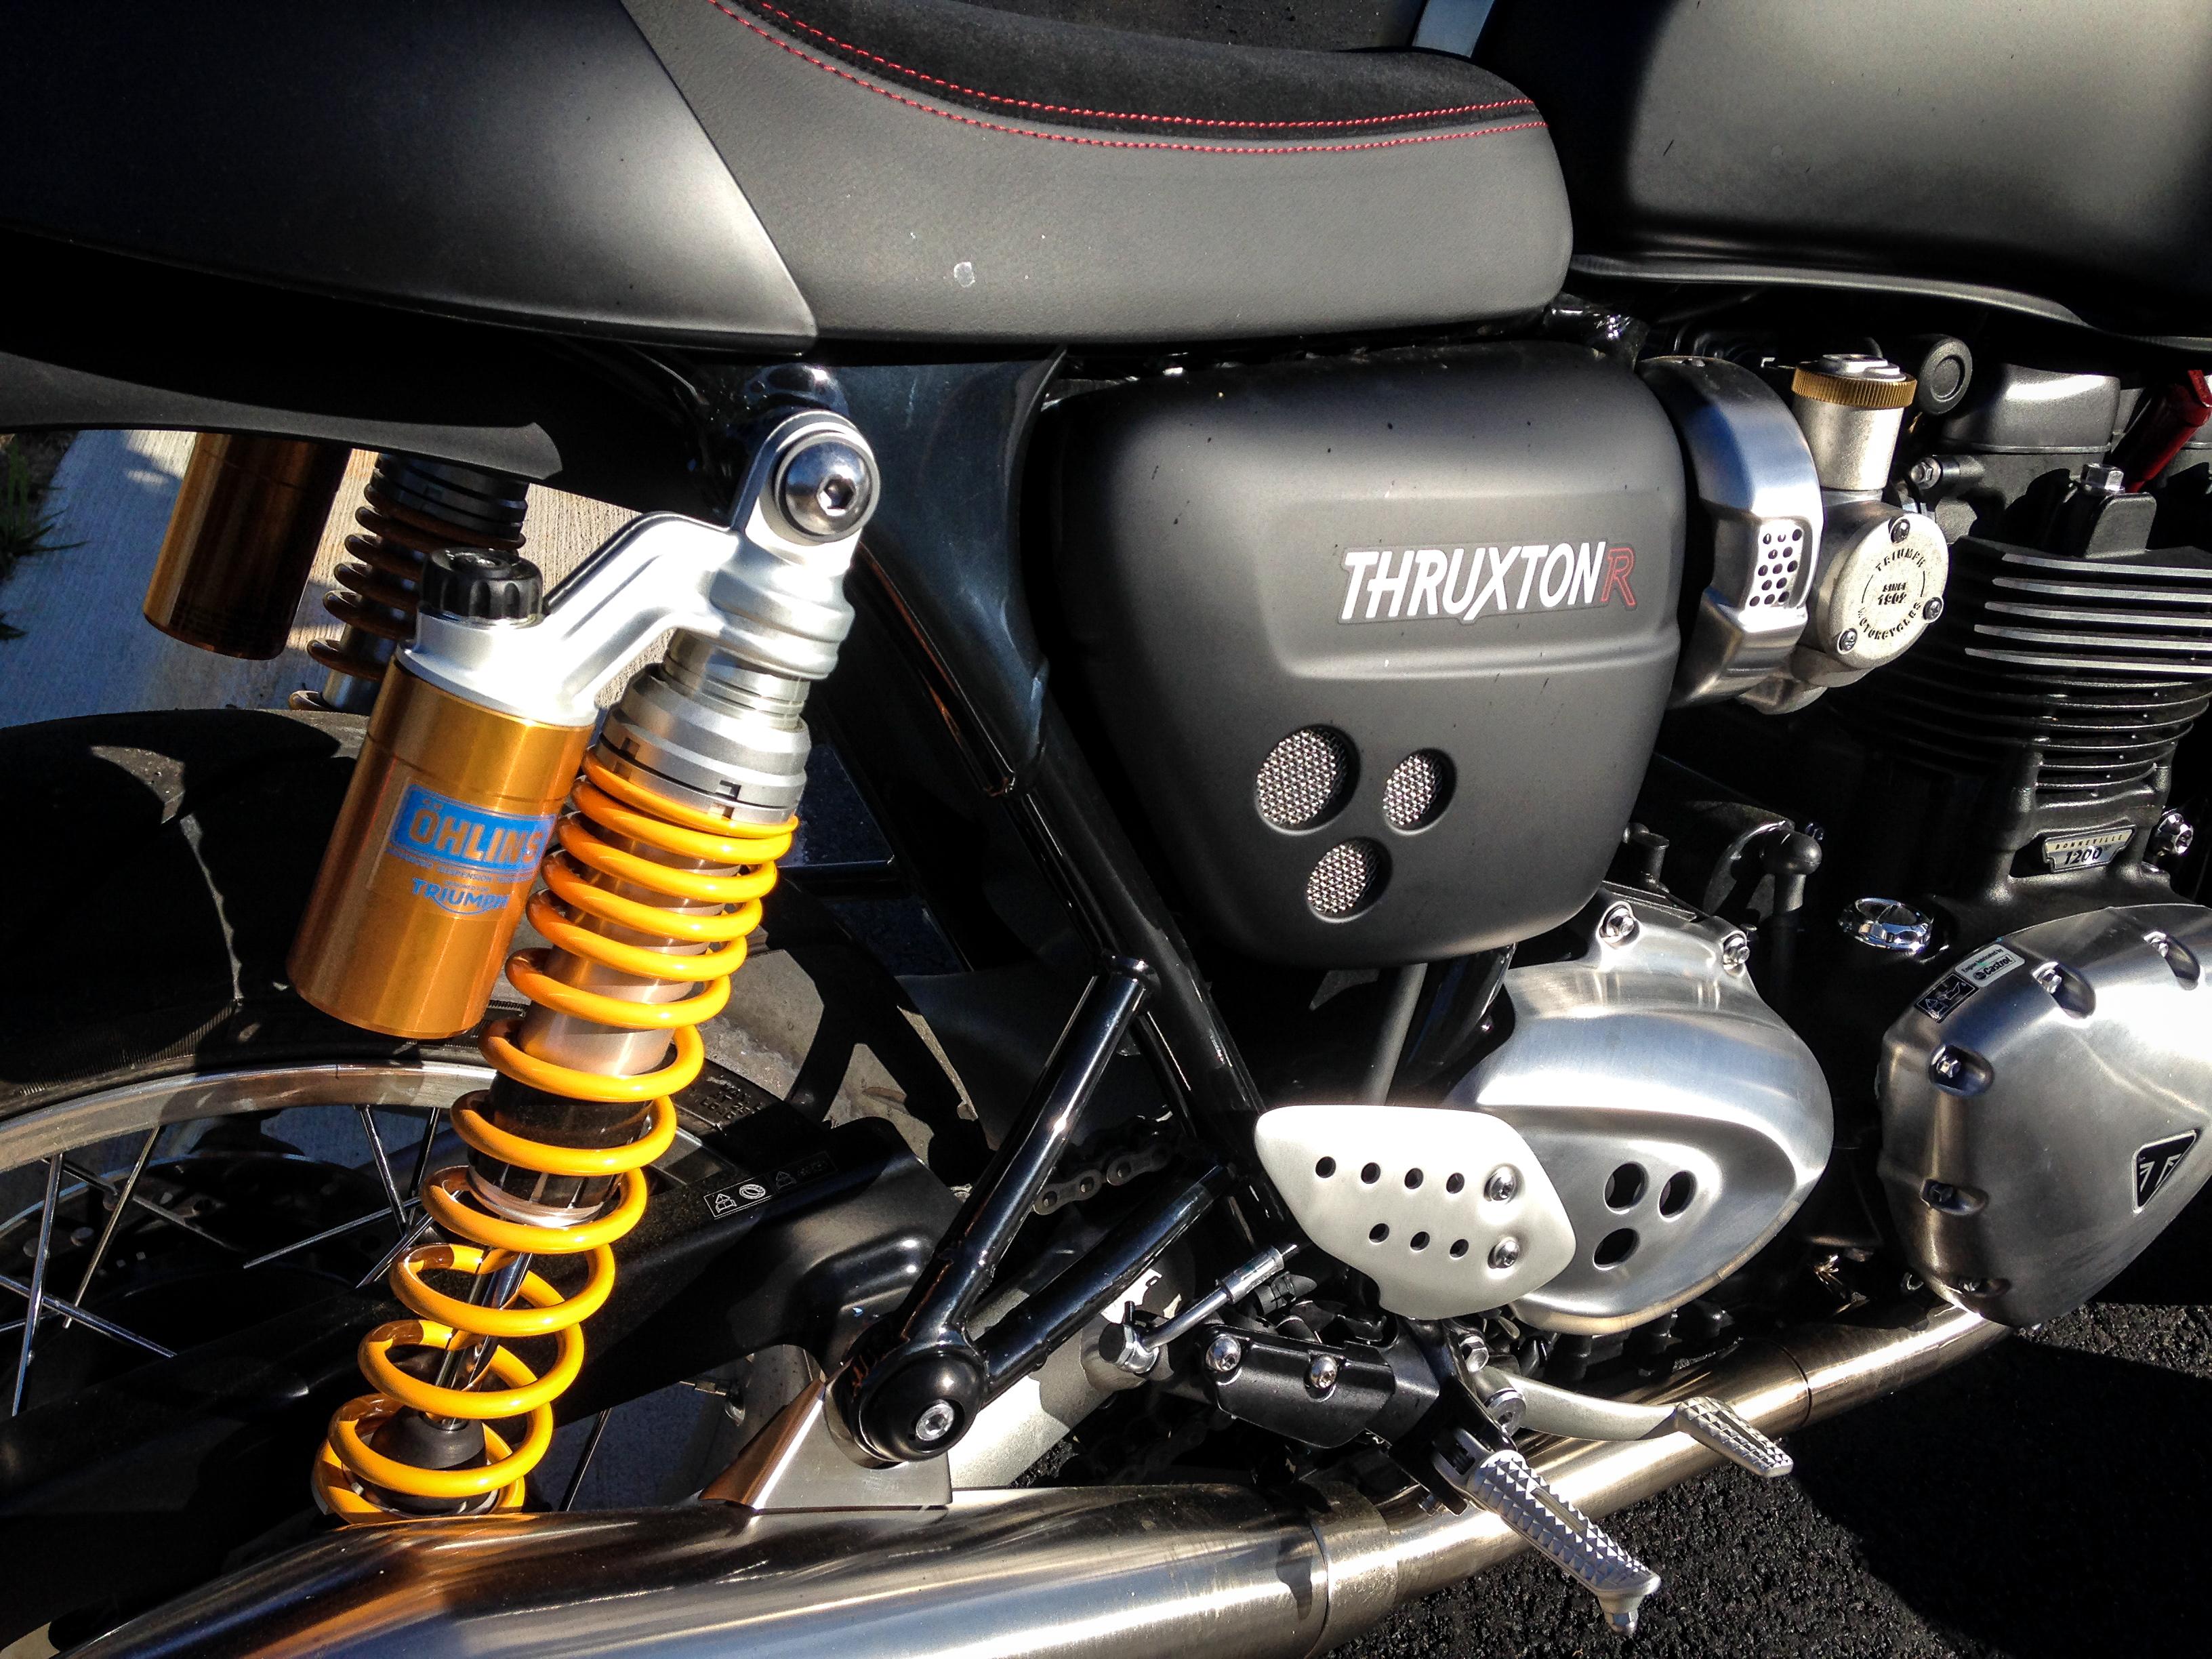 2016 Triumph Thruxton R Speed Dating In Atlanta Revzilla